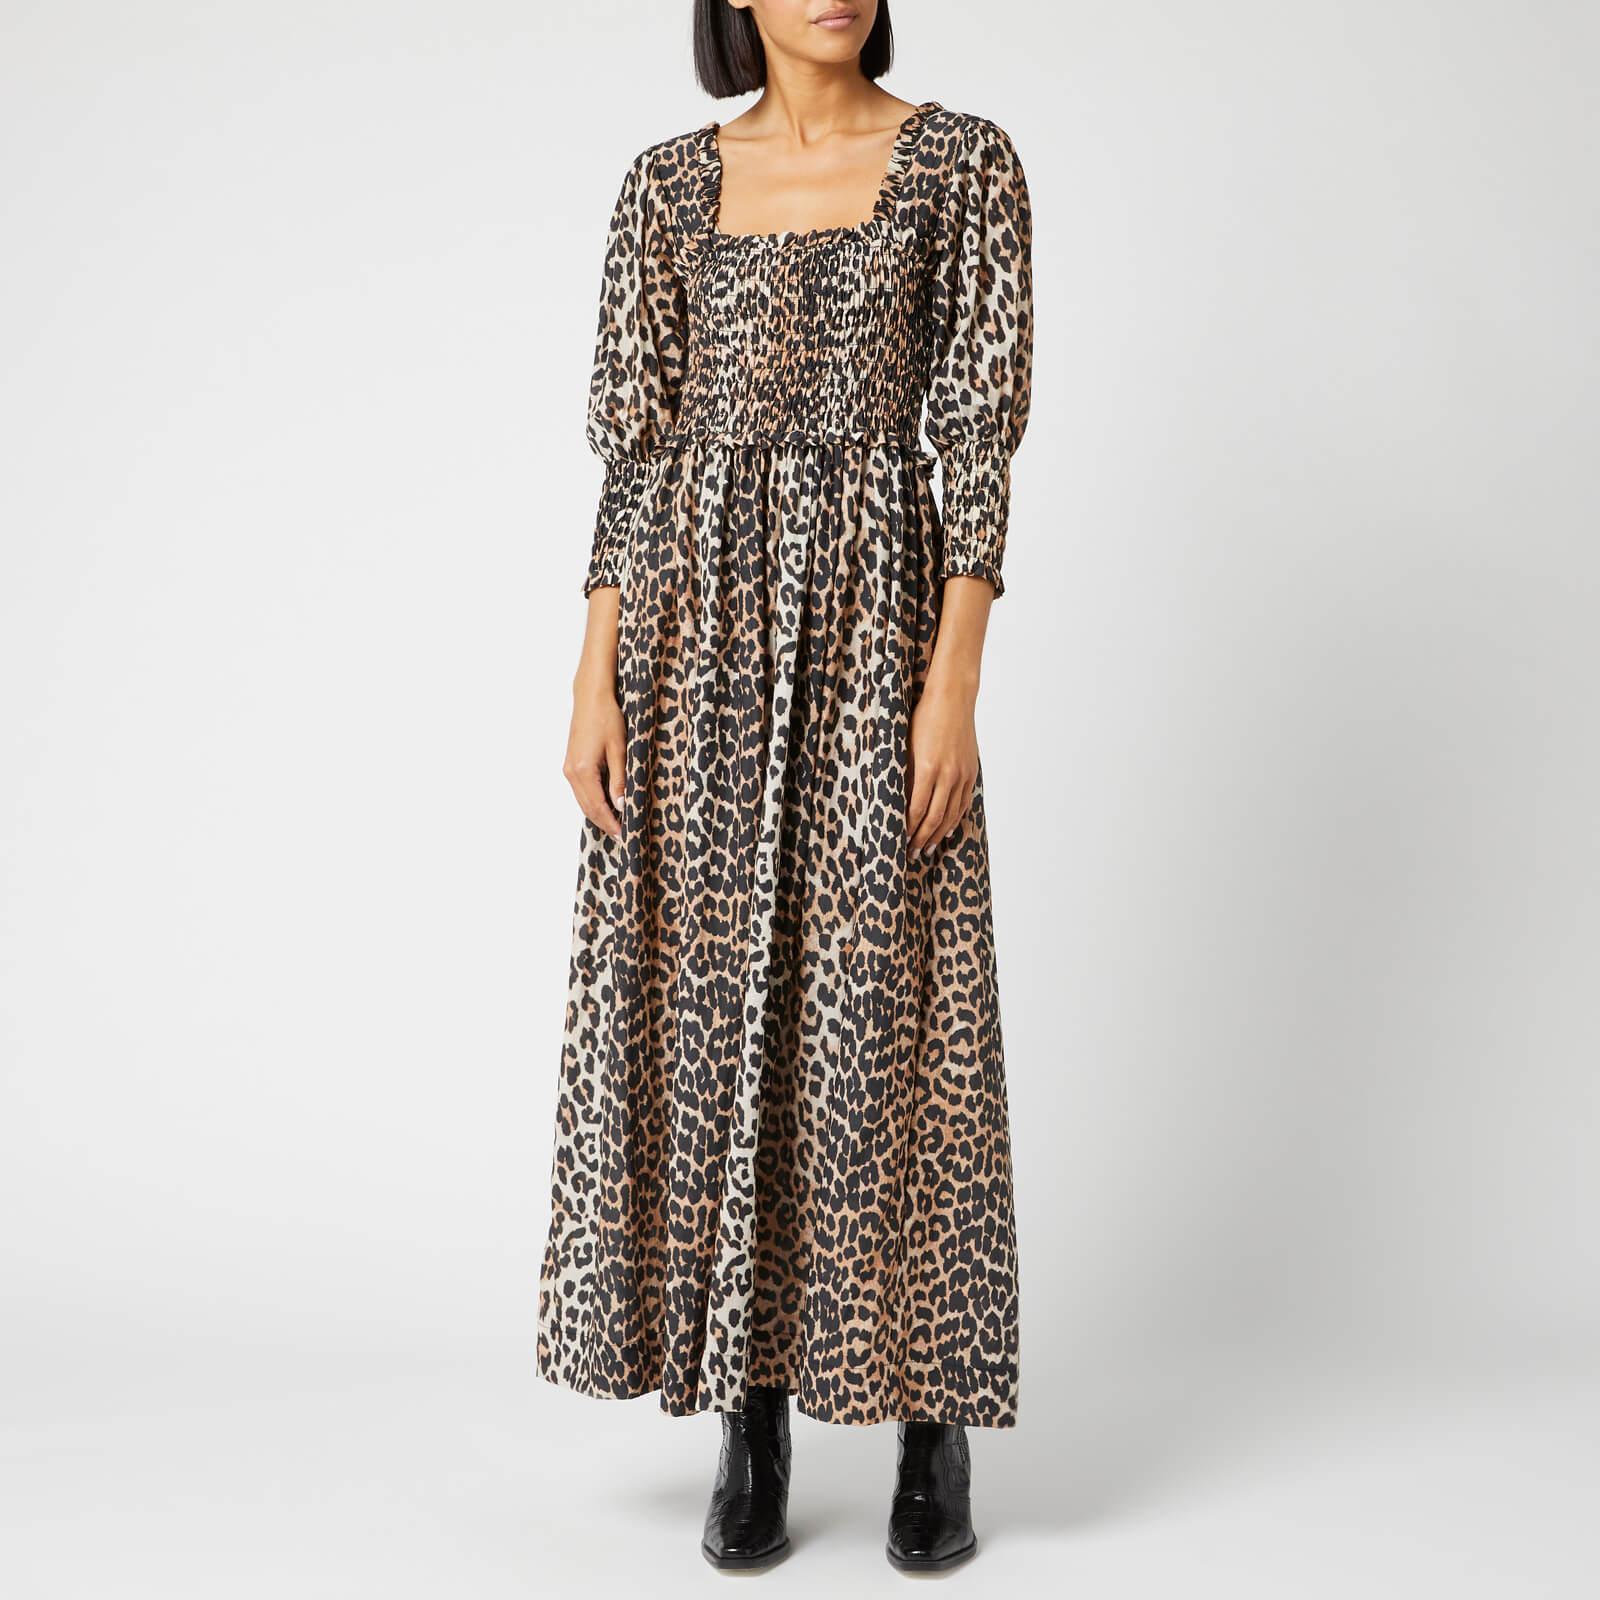 38a11631f5af Ganni Women's Cotton Silk Dress - Leopard - Free UK Delivery over £50